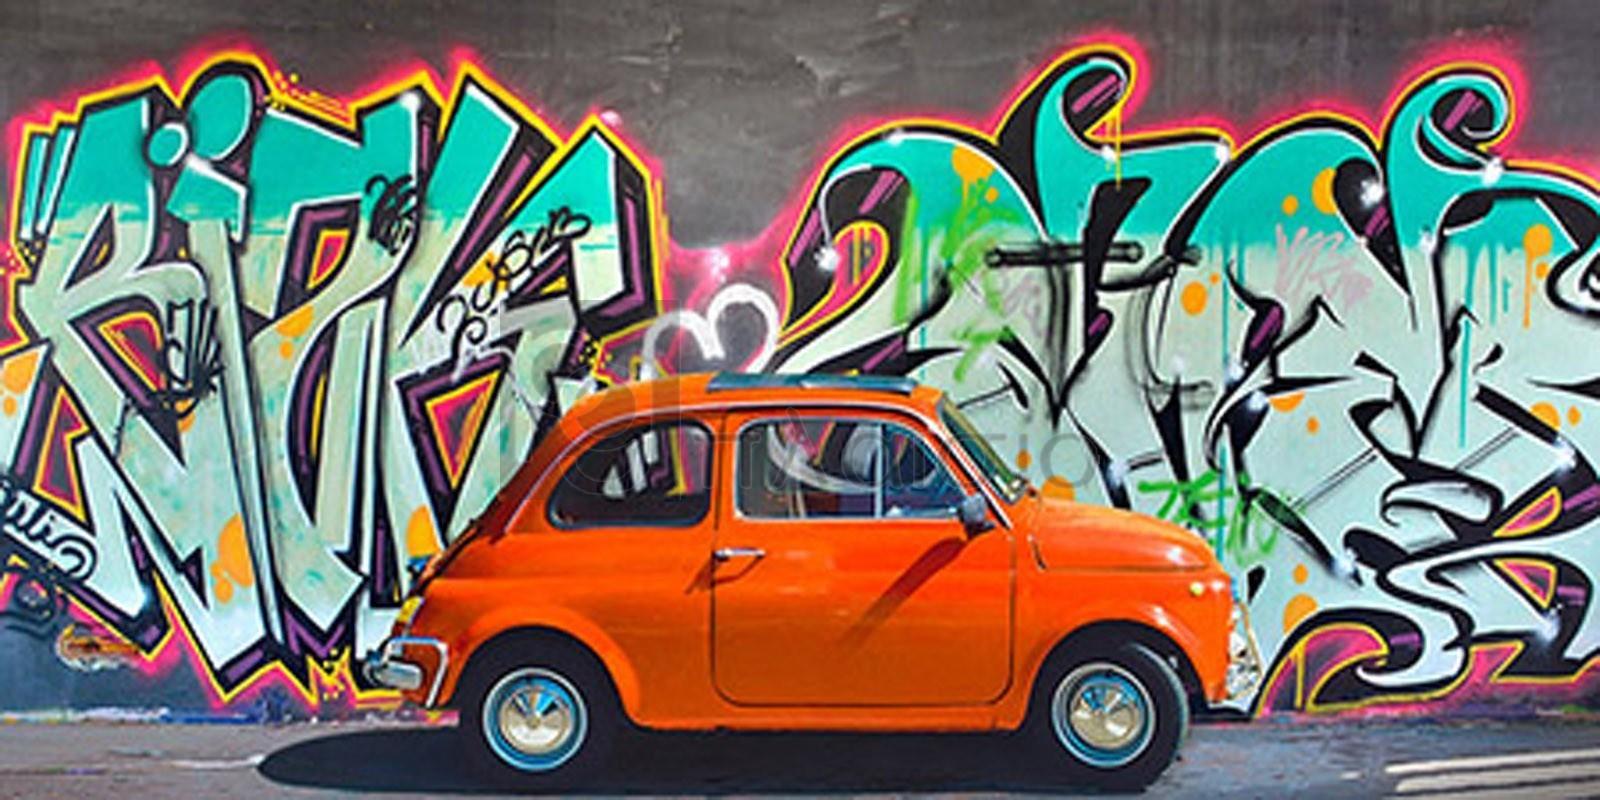 Gasoline Images - Iconic street art II